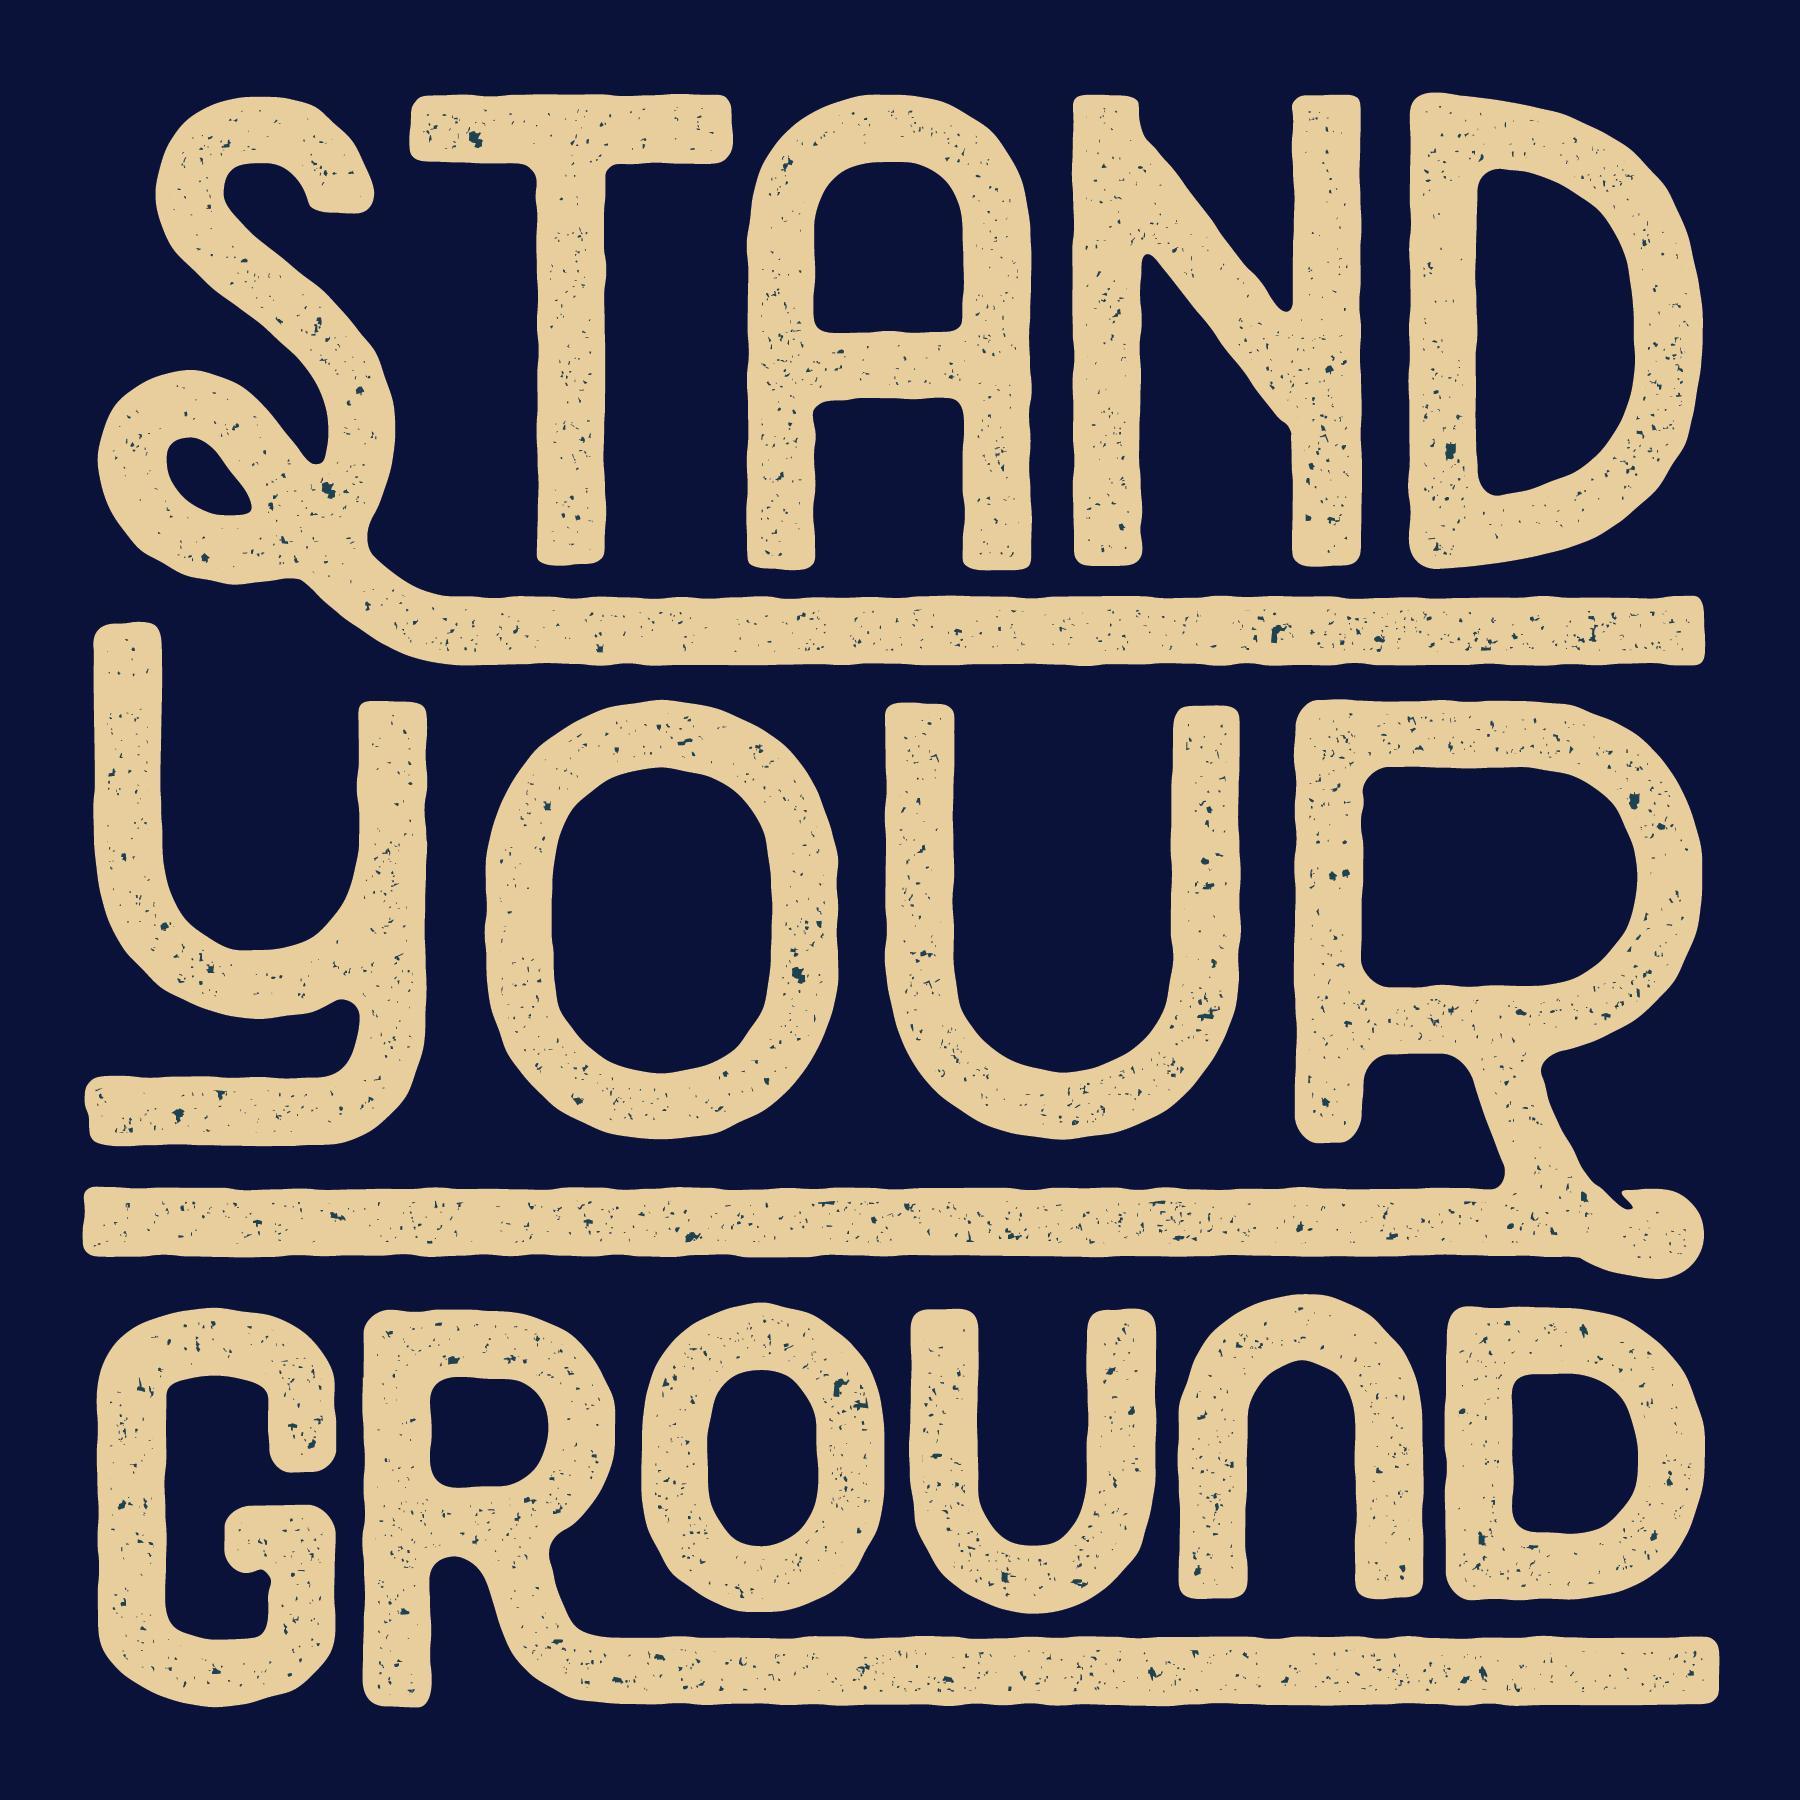 Jackson 5 / logo reinterpretation  & Tom Petty - Stand Your Ground    - image 10 - student project